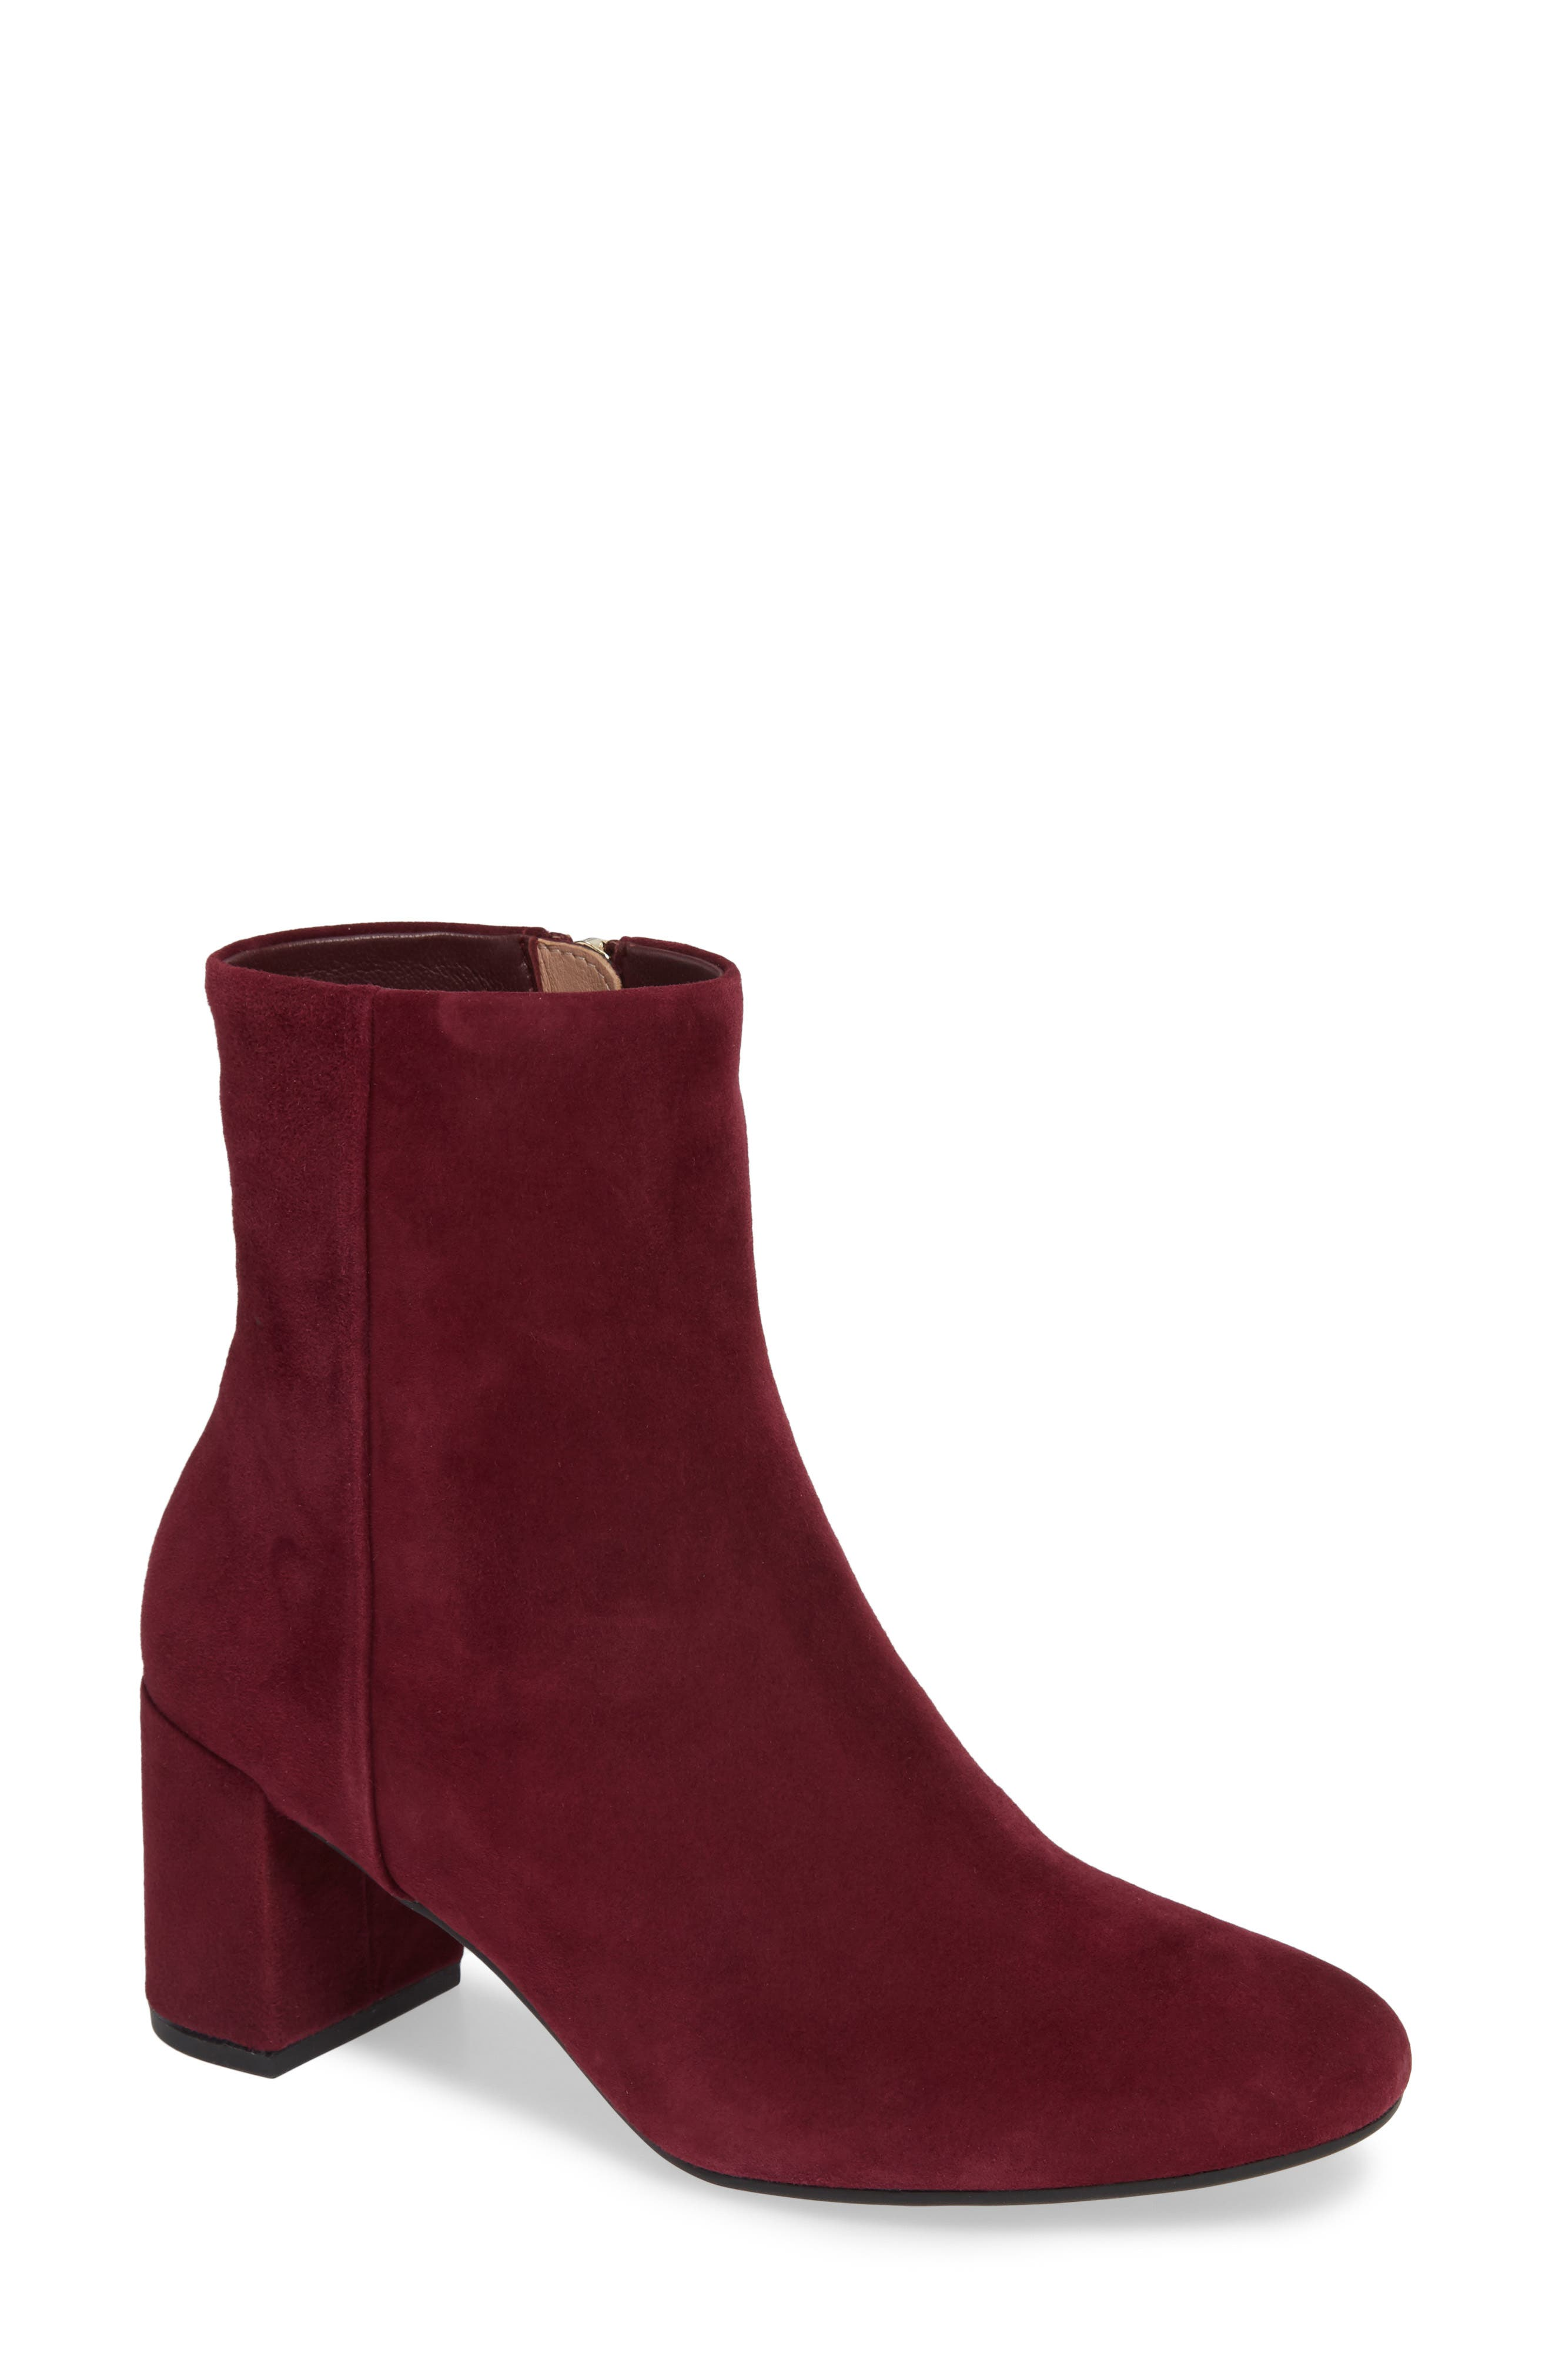 8b7ecbb962 Taryn Rose Cassidy Block Heel Bootie, Red